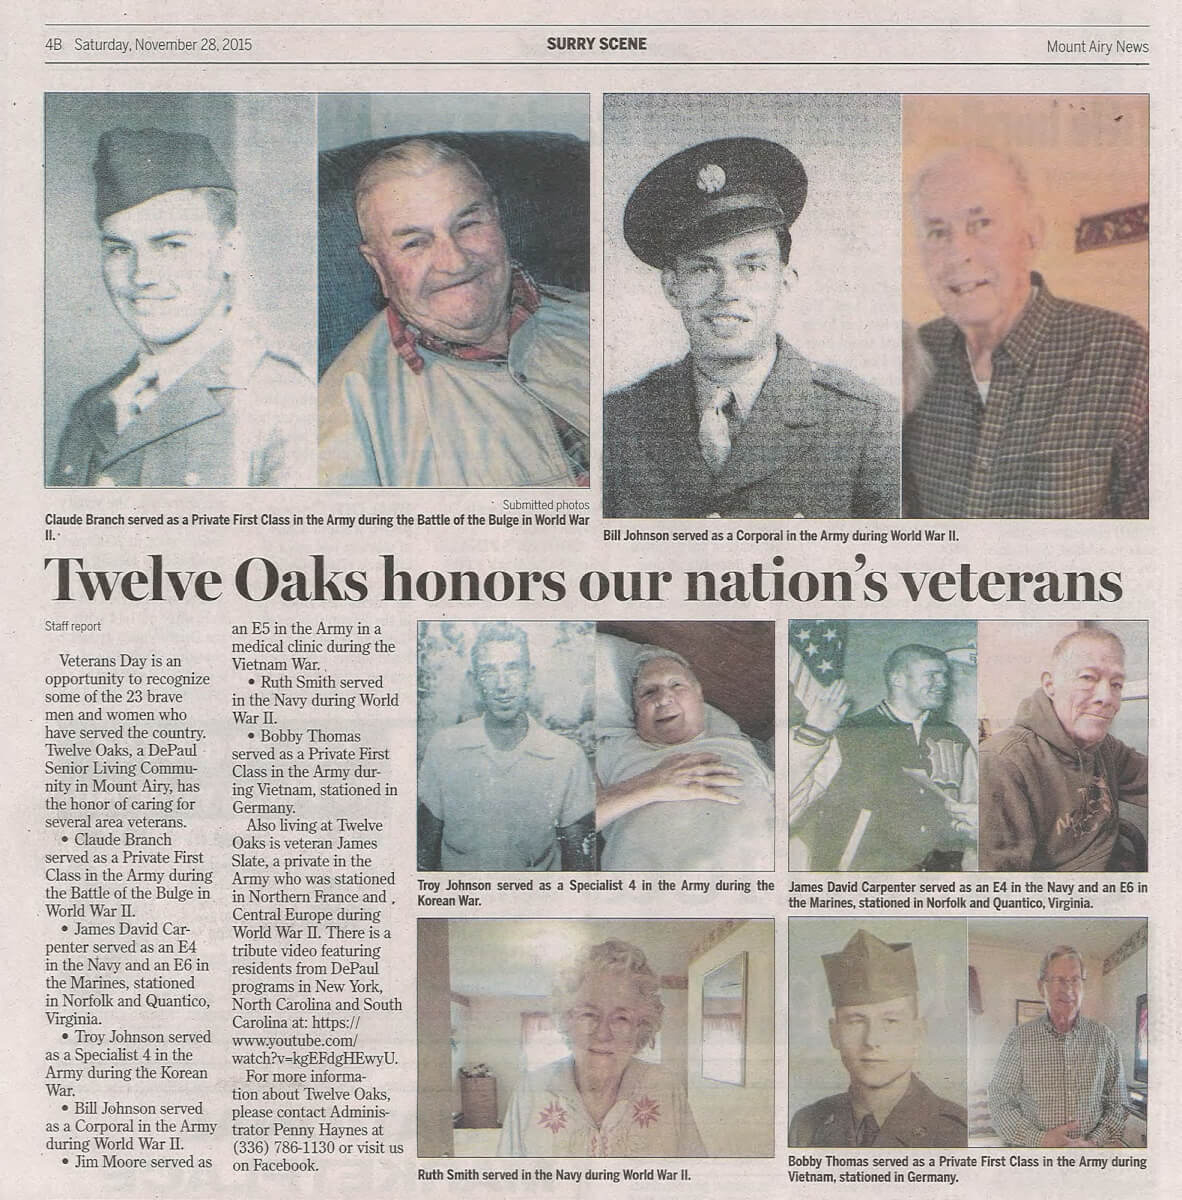 Twelve Oaks honors Veteran's Day article in the Surry Scene November 28, 2015